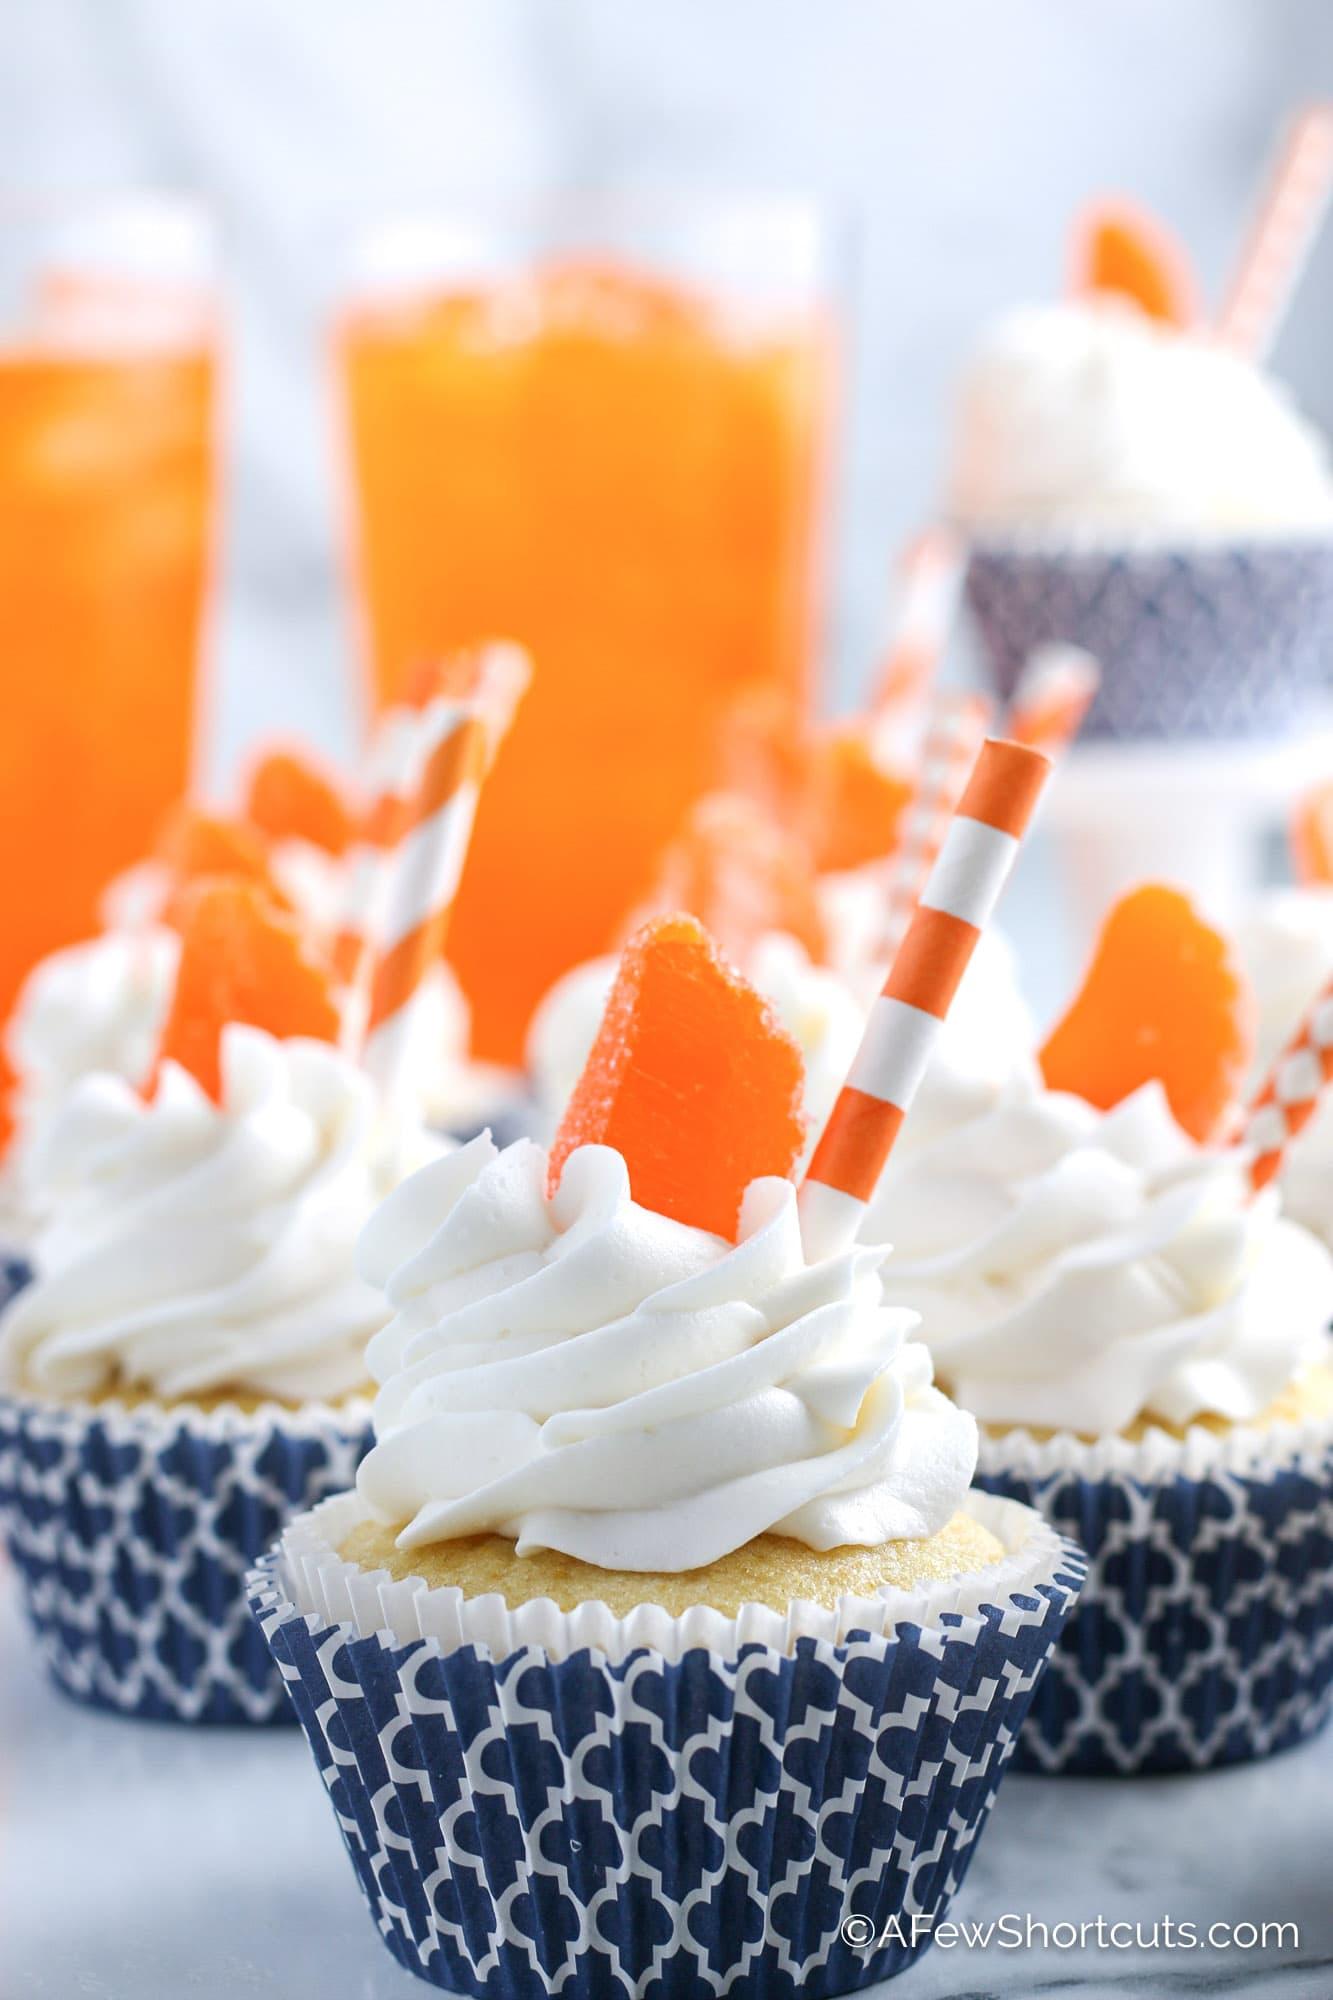 Orange Creamsicle Cupcakes with orange candy and orange straw